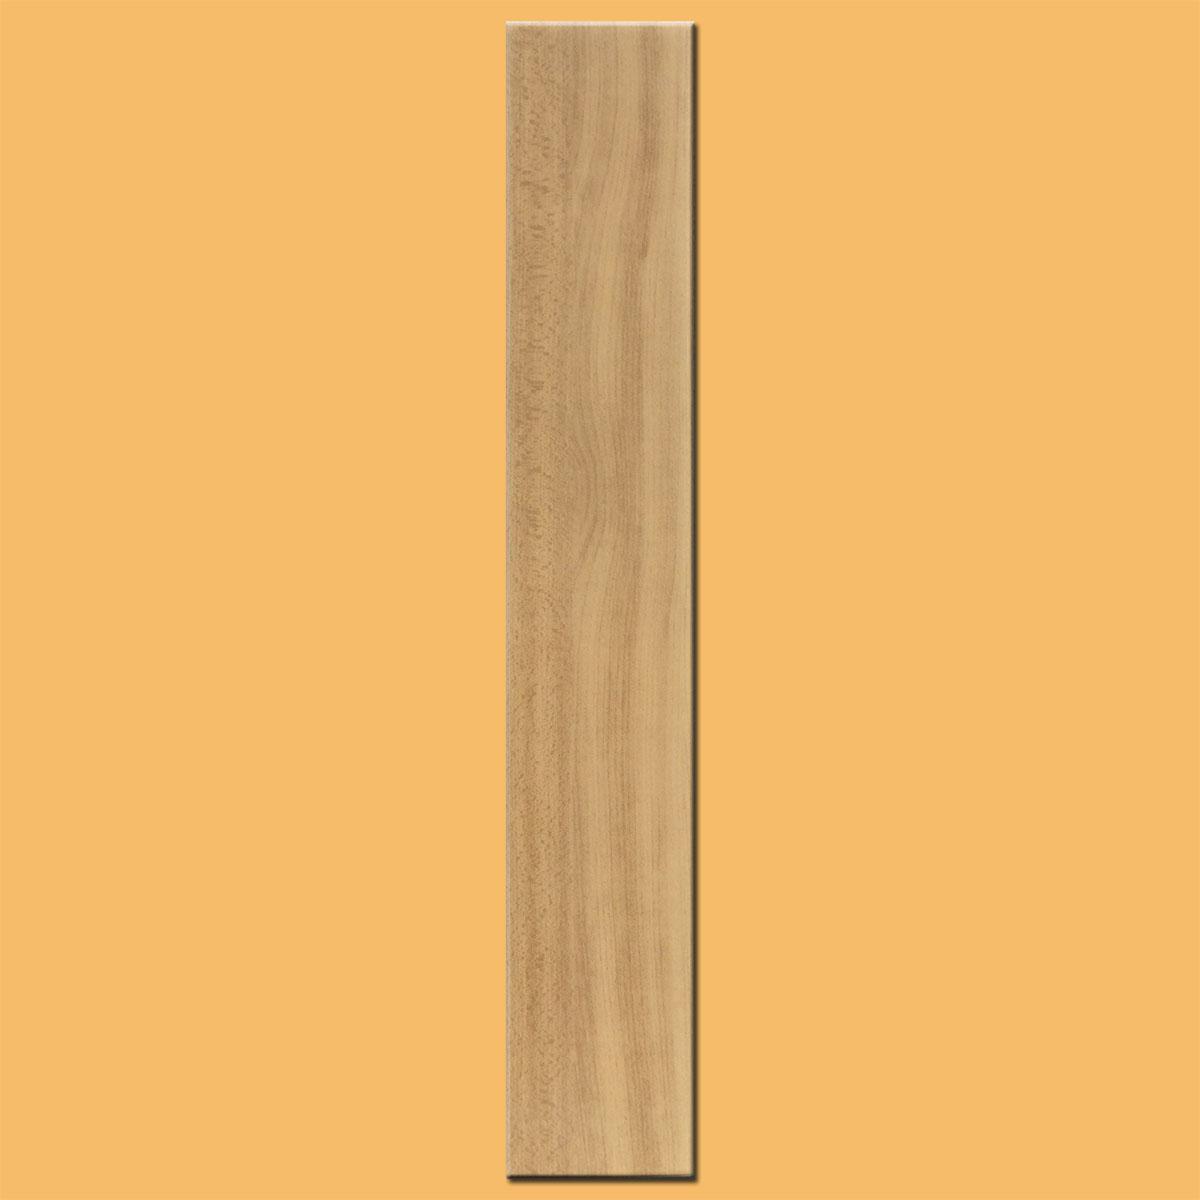 Pine Finish Plank - Foam Ceiling Plank 30pc Case, Antique Ceilings ...